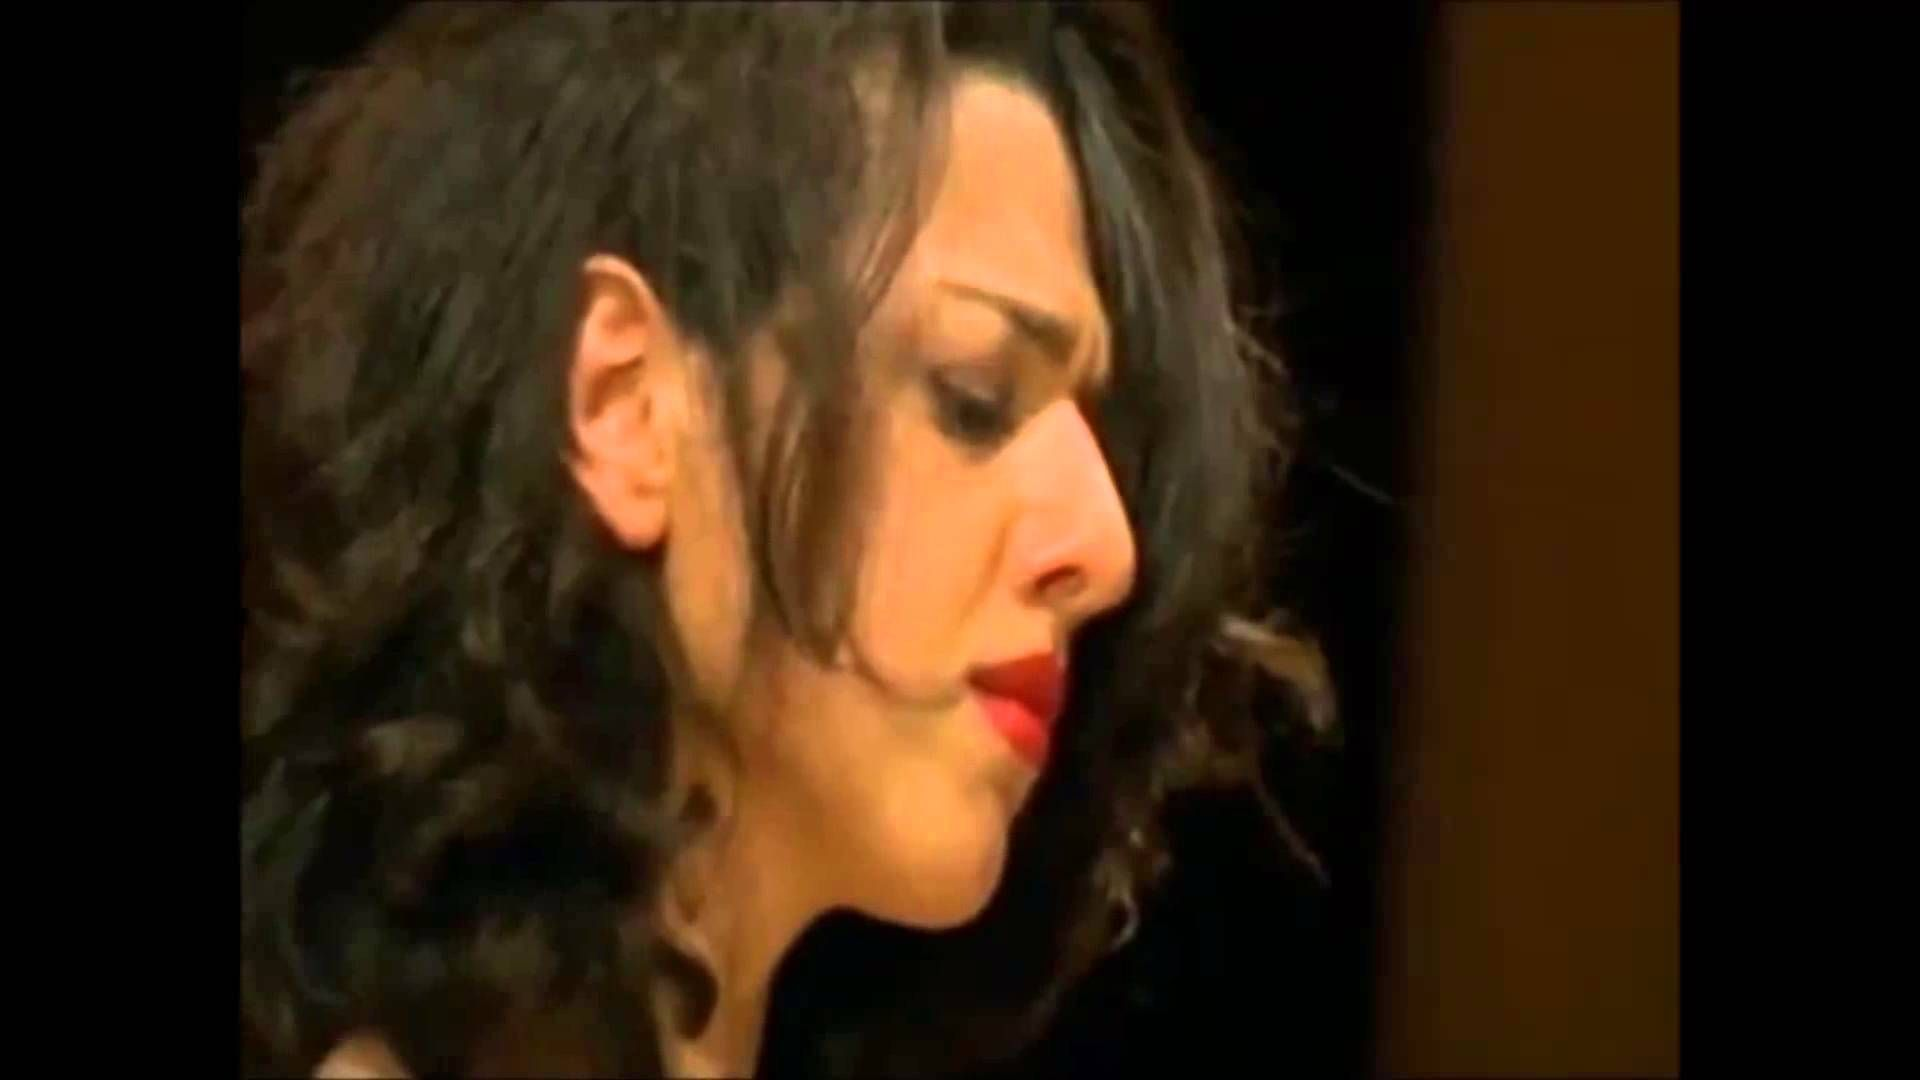 Maurice Ravel Ma Mère L Oye Martha Argerich Khatia Buniatishvili Klassieke Muziek Muziek Componisten